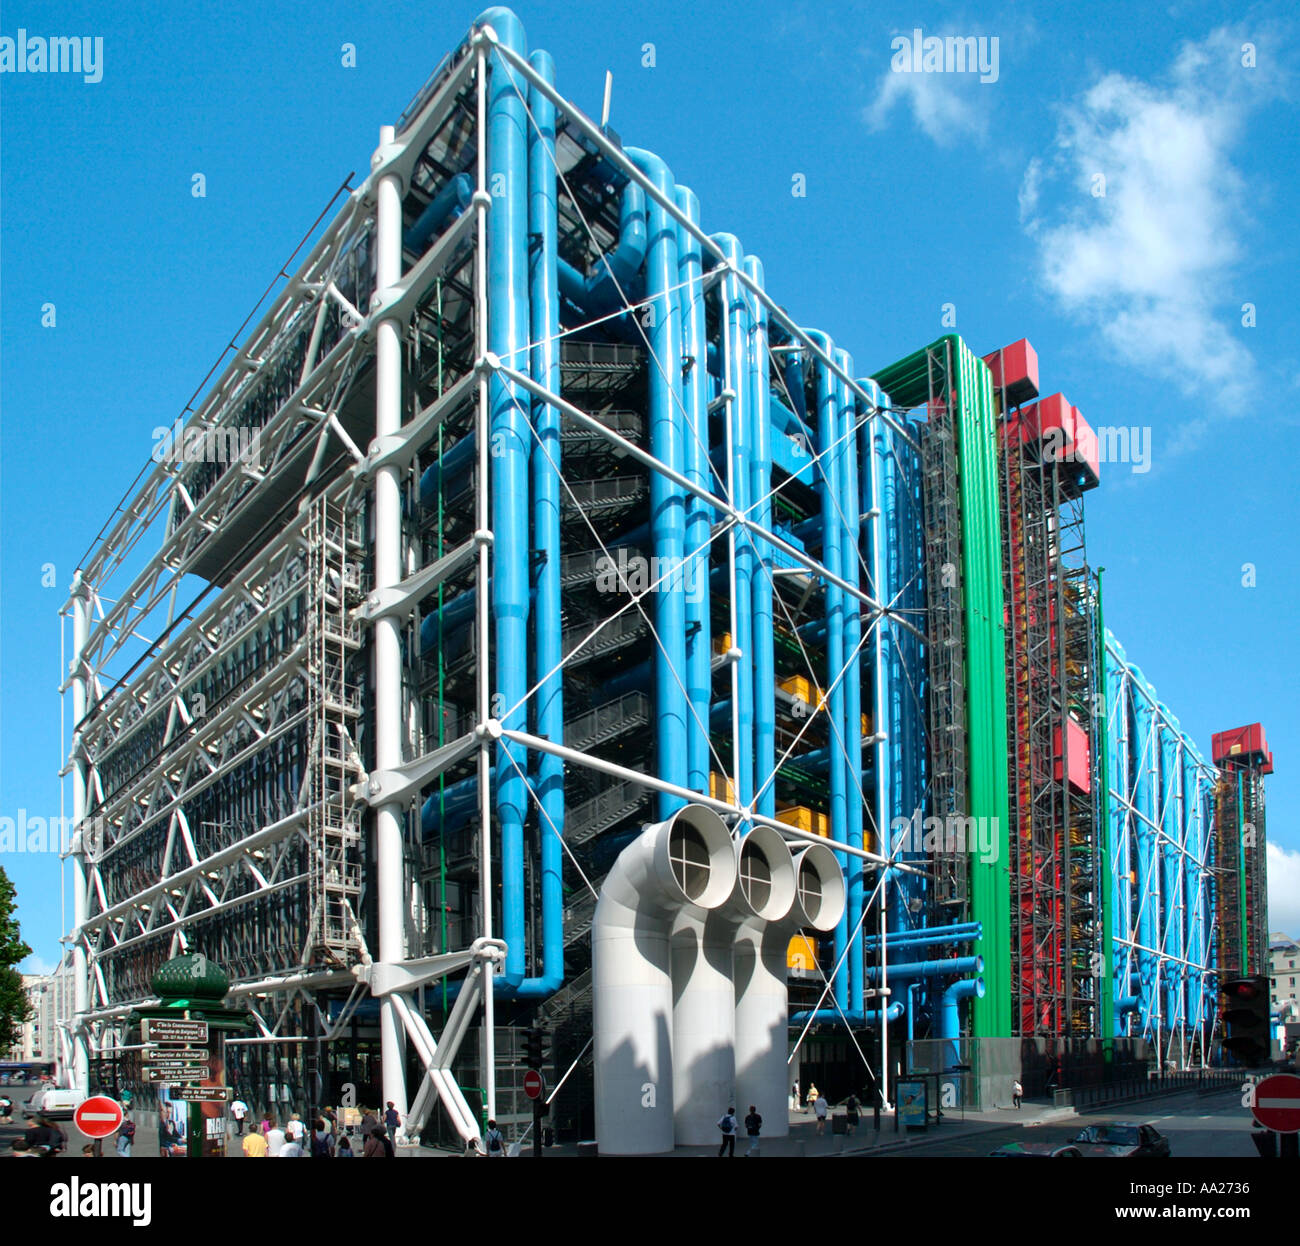 Centre_Georges_Pompidou